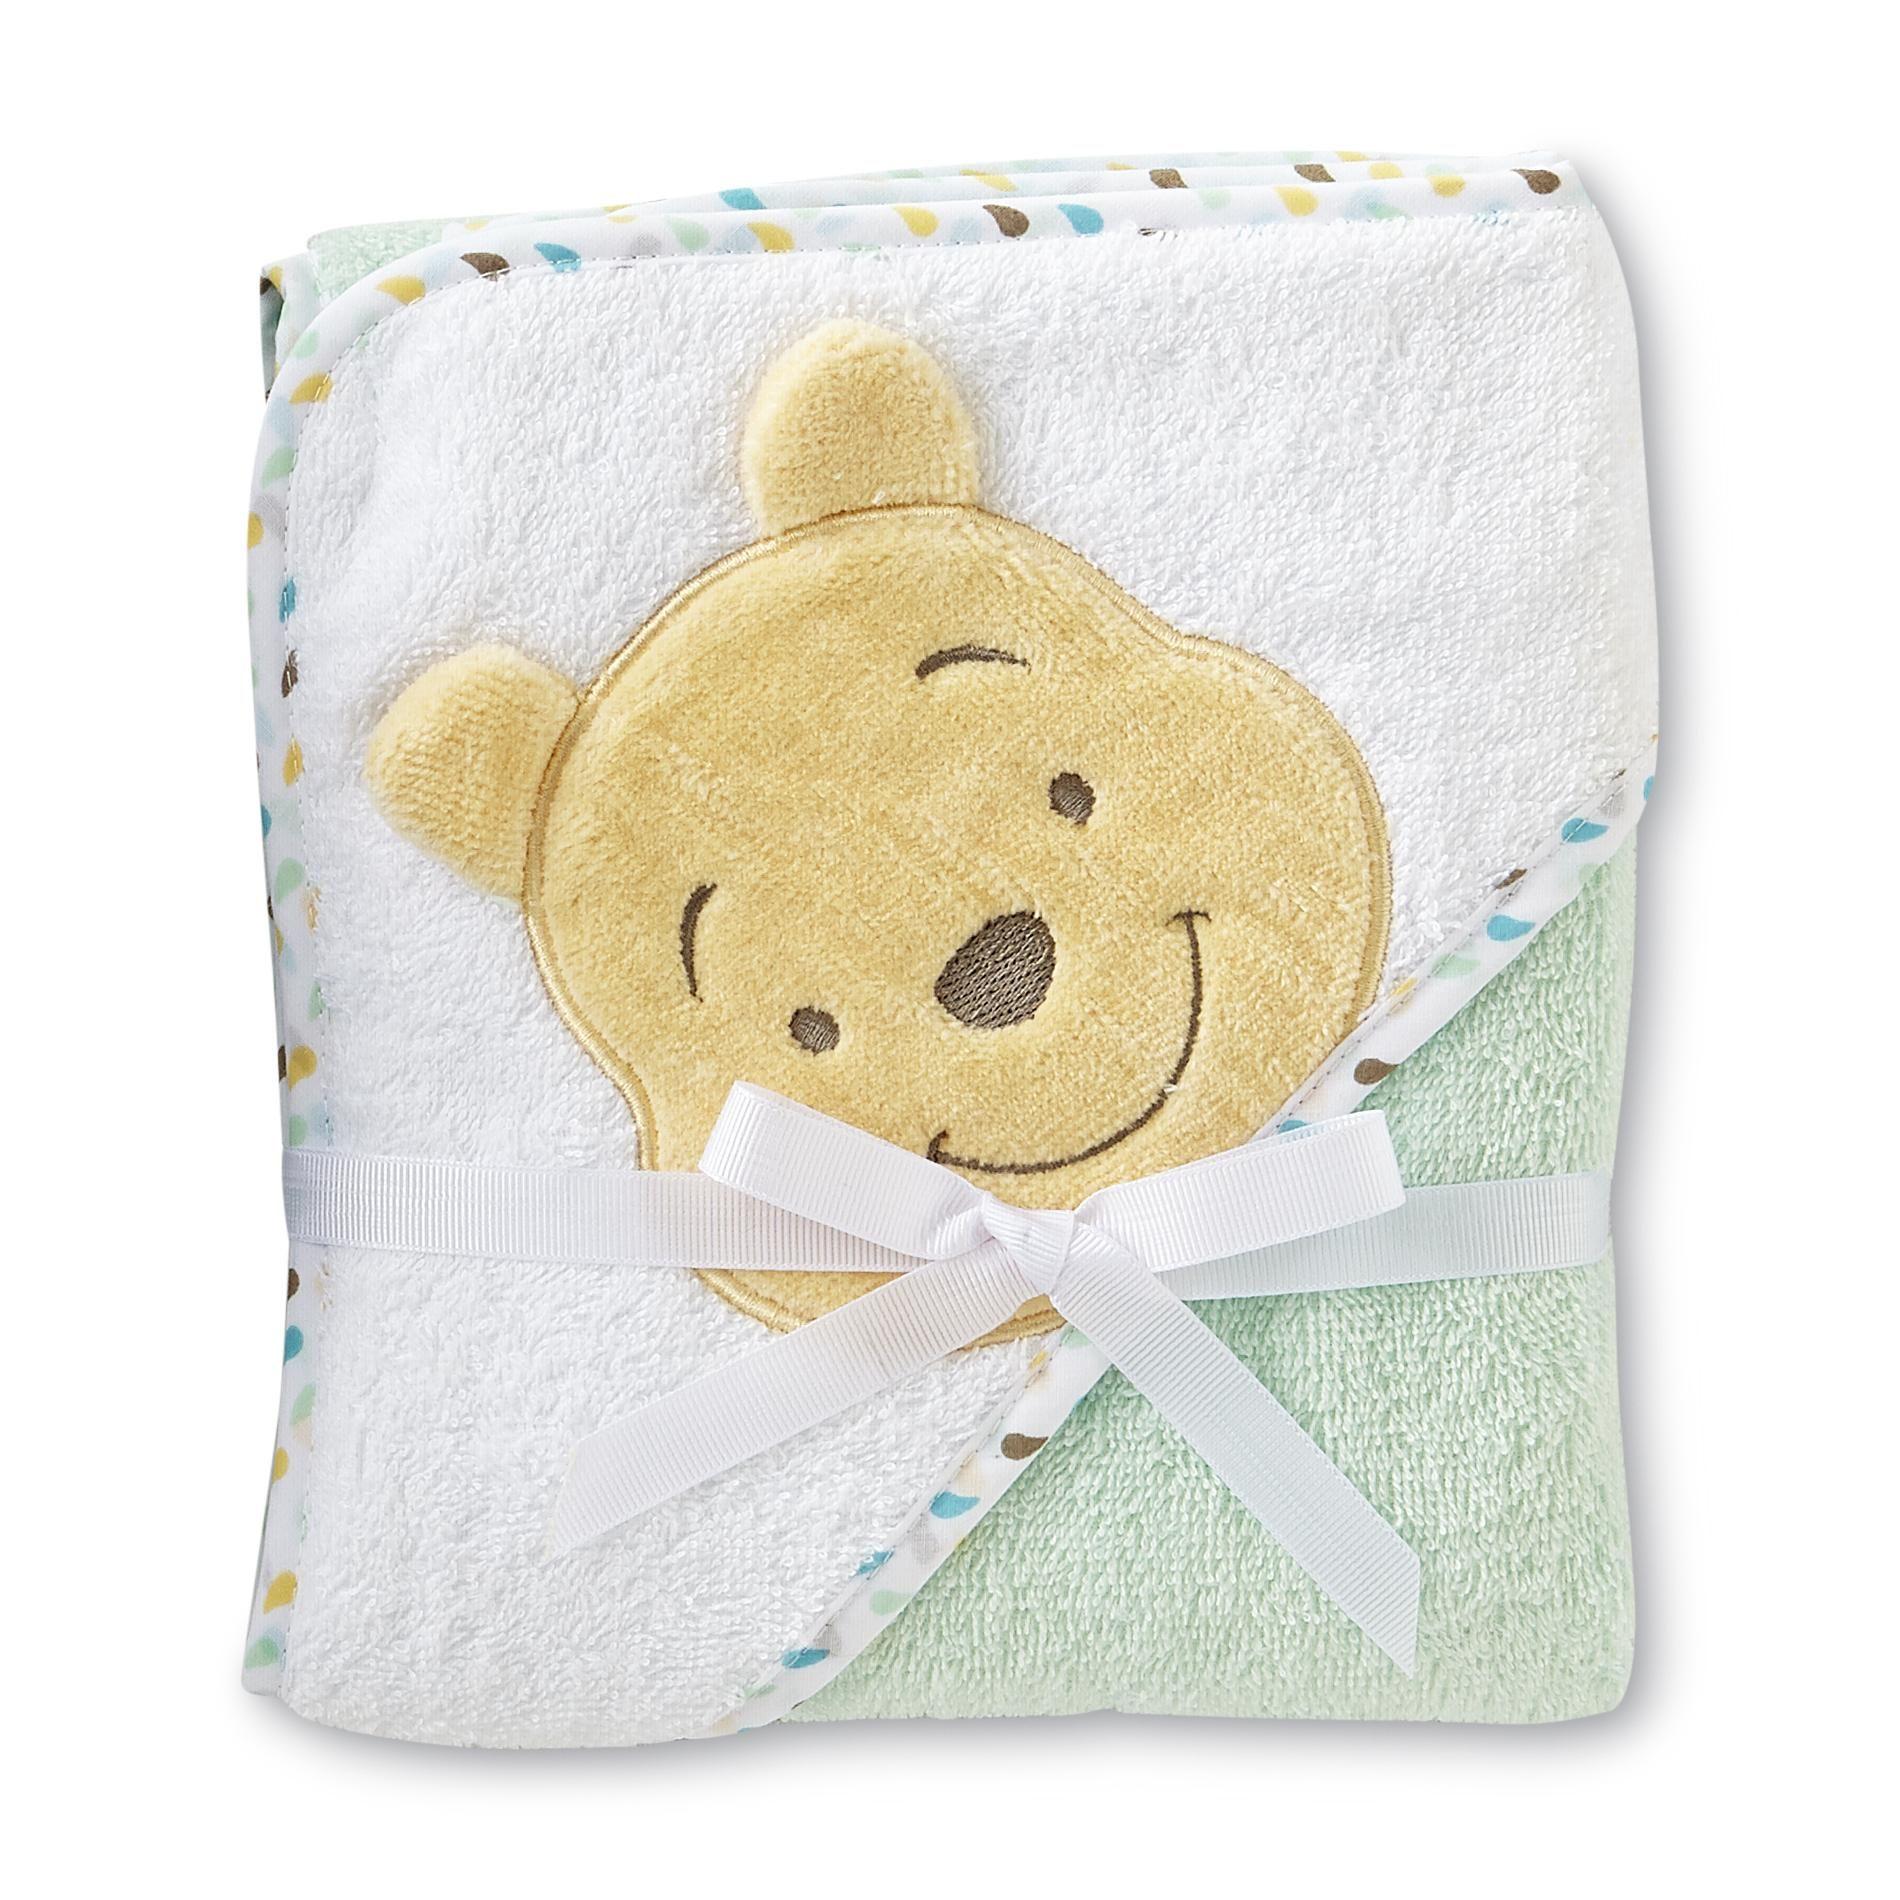 Cuddletime winnie the pooh infant boys hooded towel